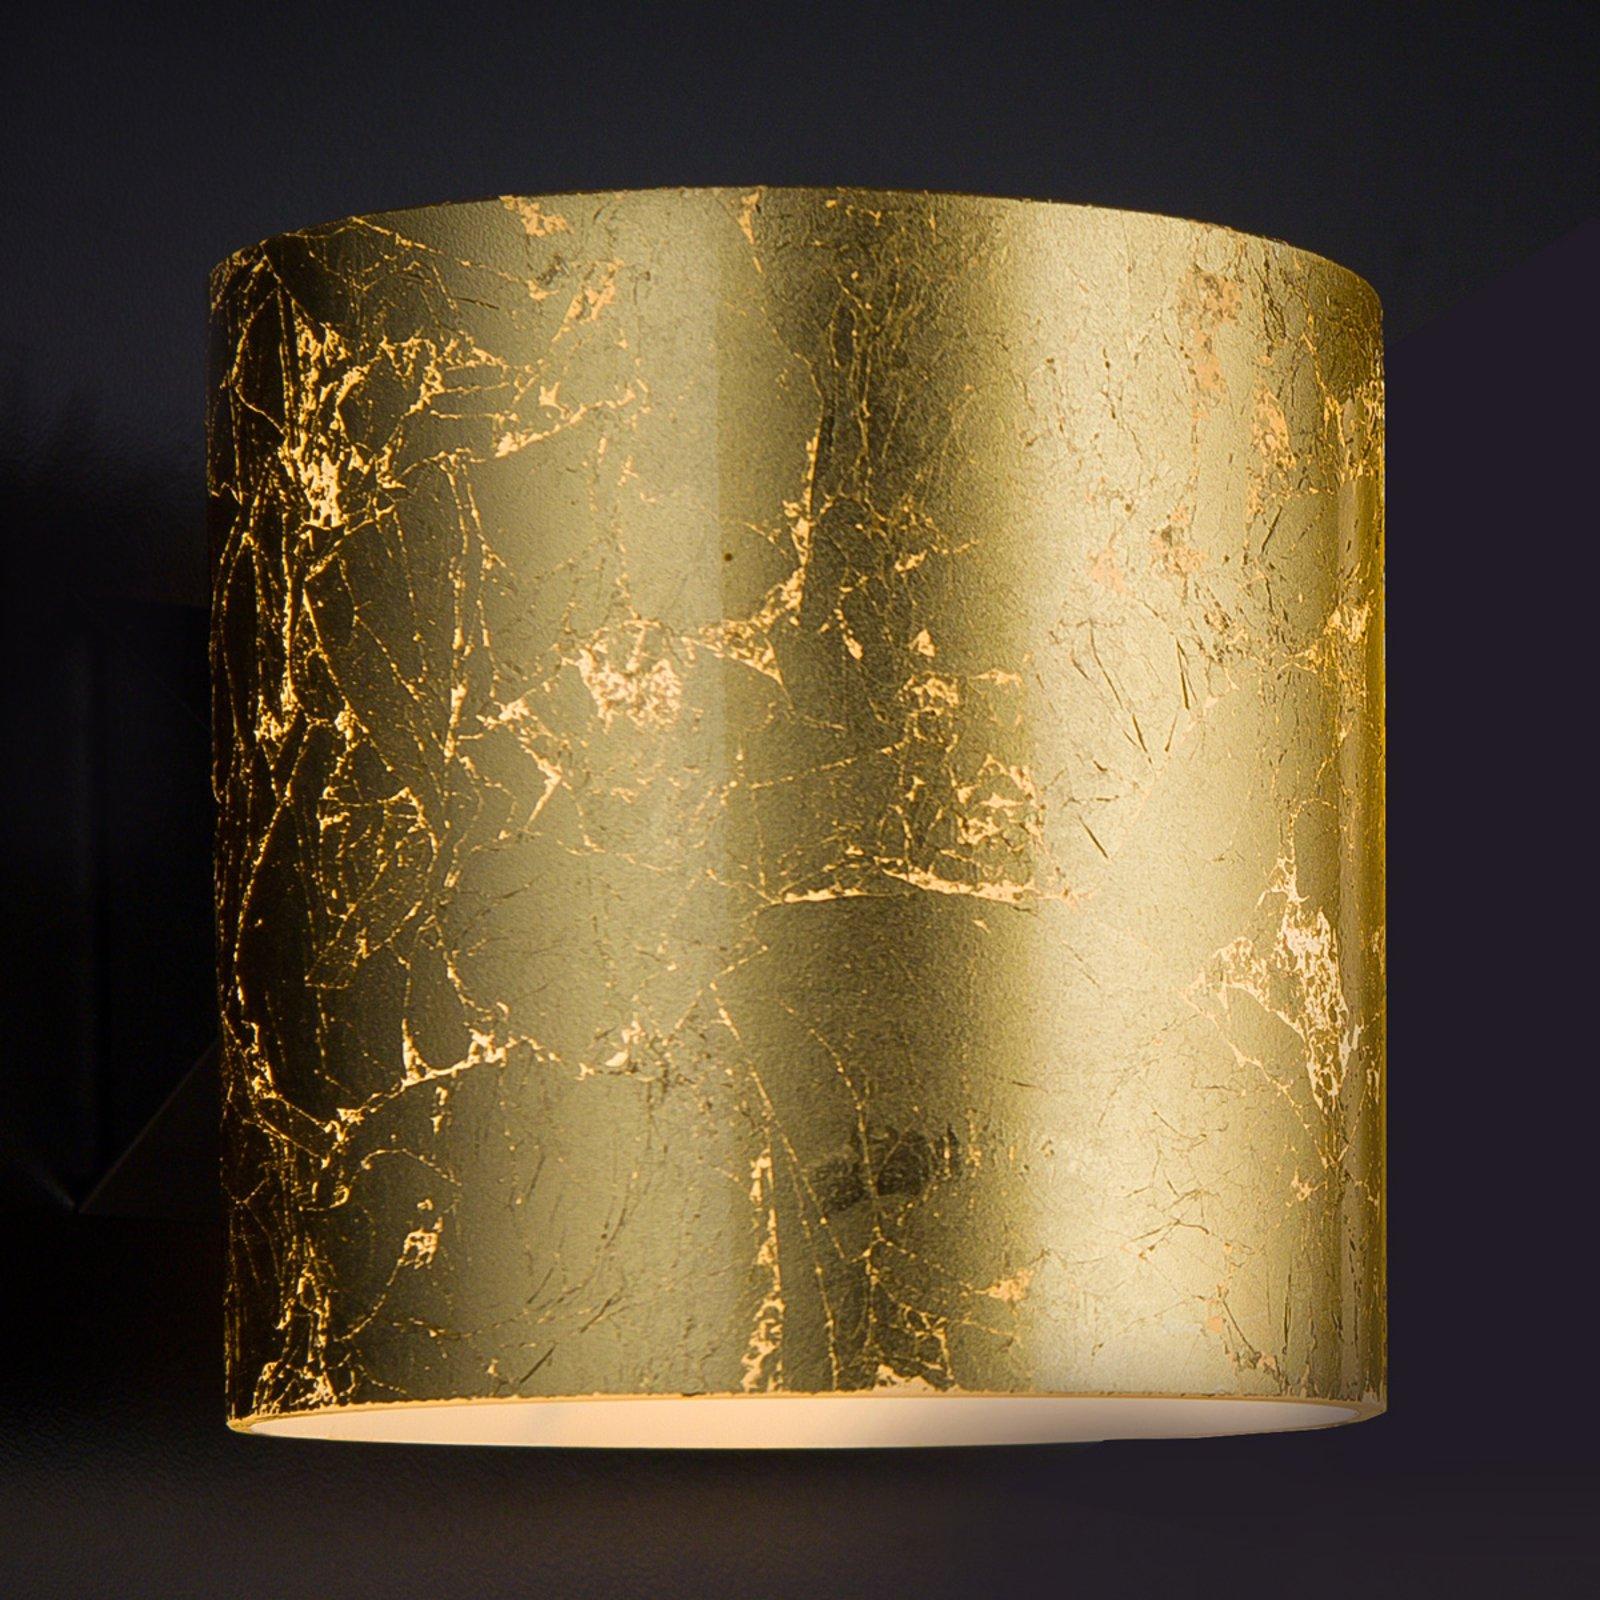 Brick gylden designer-vegglampe, 1 lyskilde